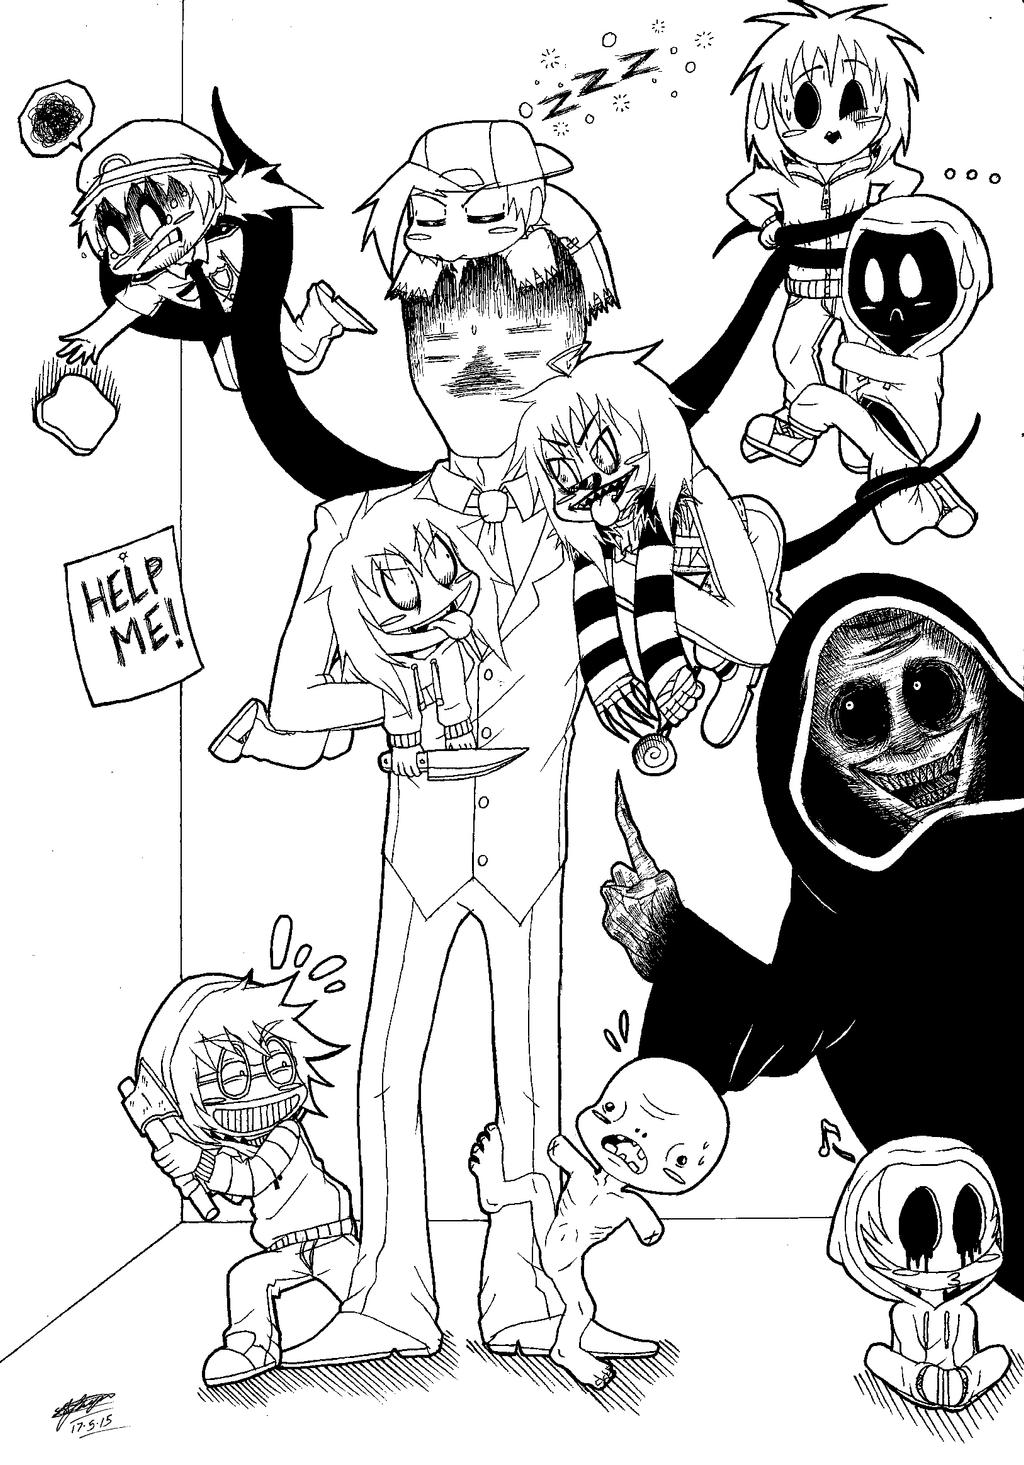 creepypasta coloring pages - chibi creepypasta mayhem 3 by shannonxnaruto on deviantart